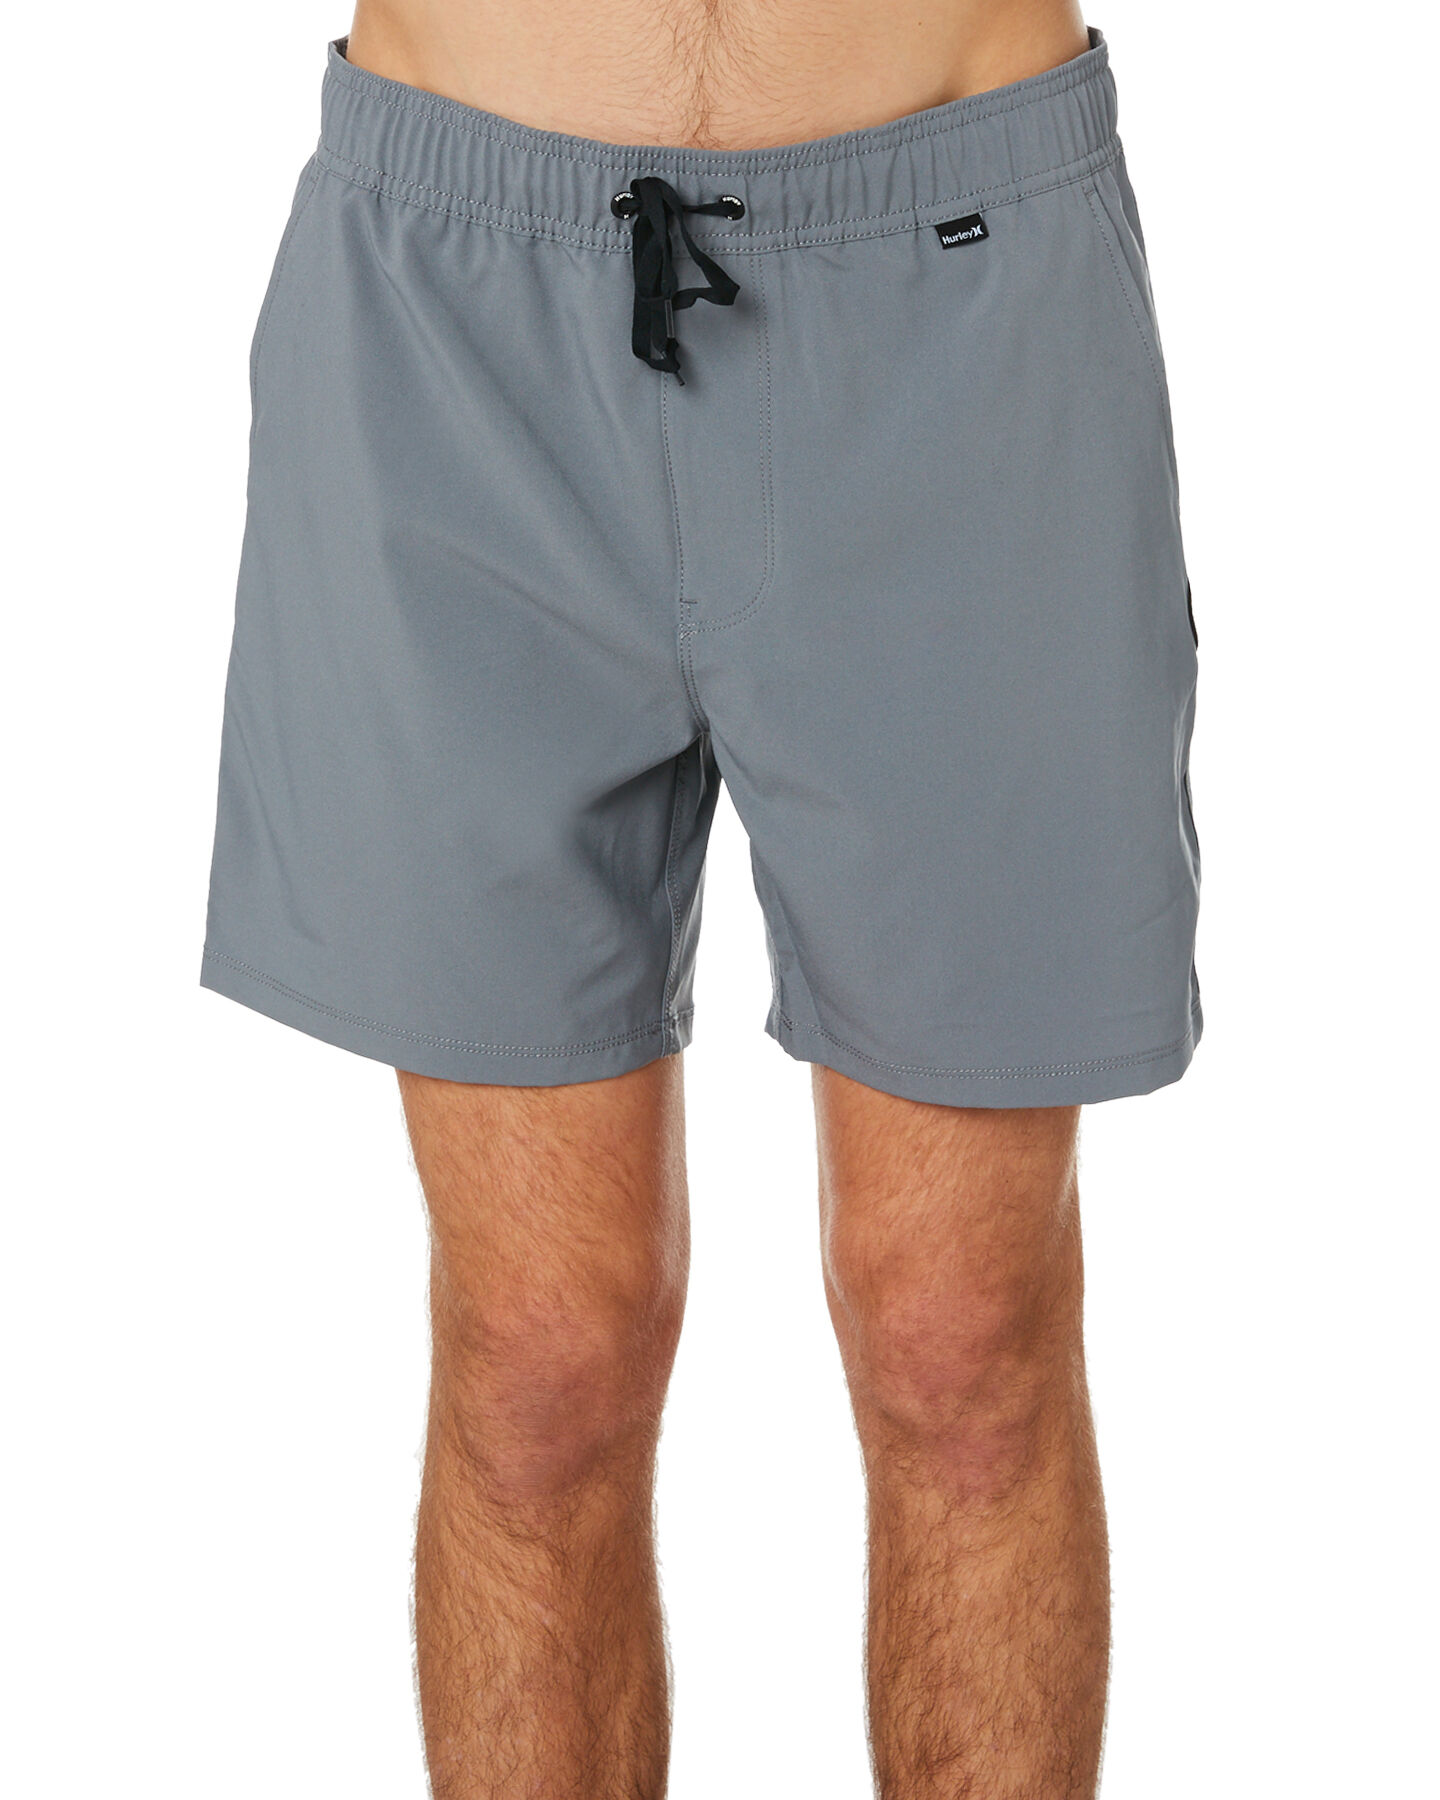 77bbf4bee3 Swimwear Trend Mark Hurley Board Shorts Swim Trunks Gray/white Surf Mens  Size 34 Men's Clothing